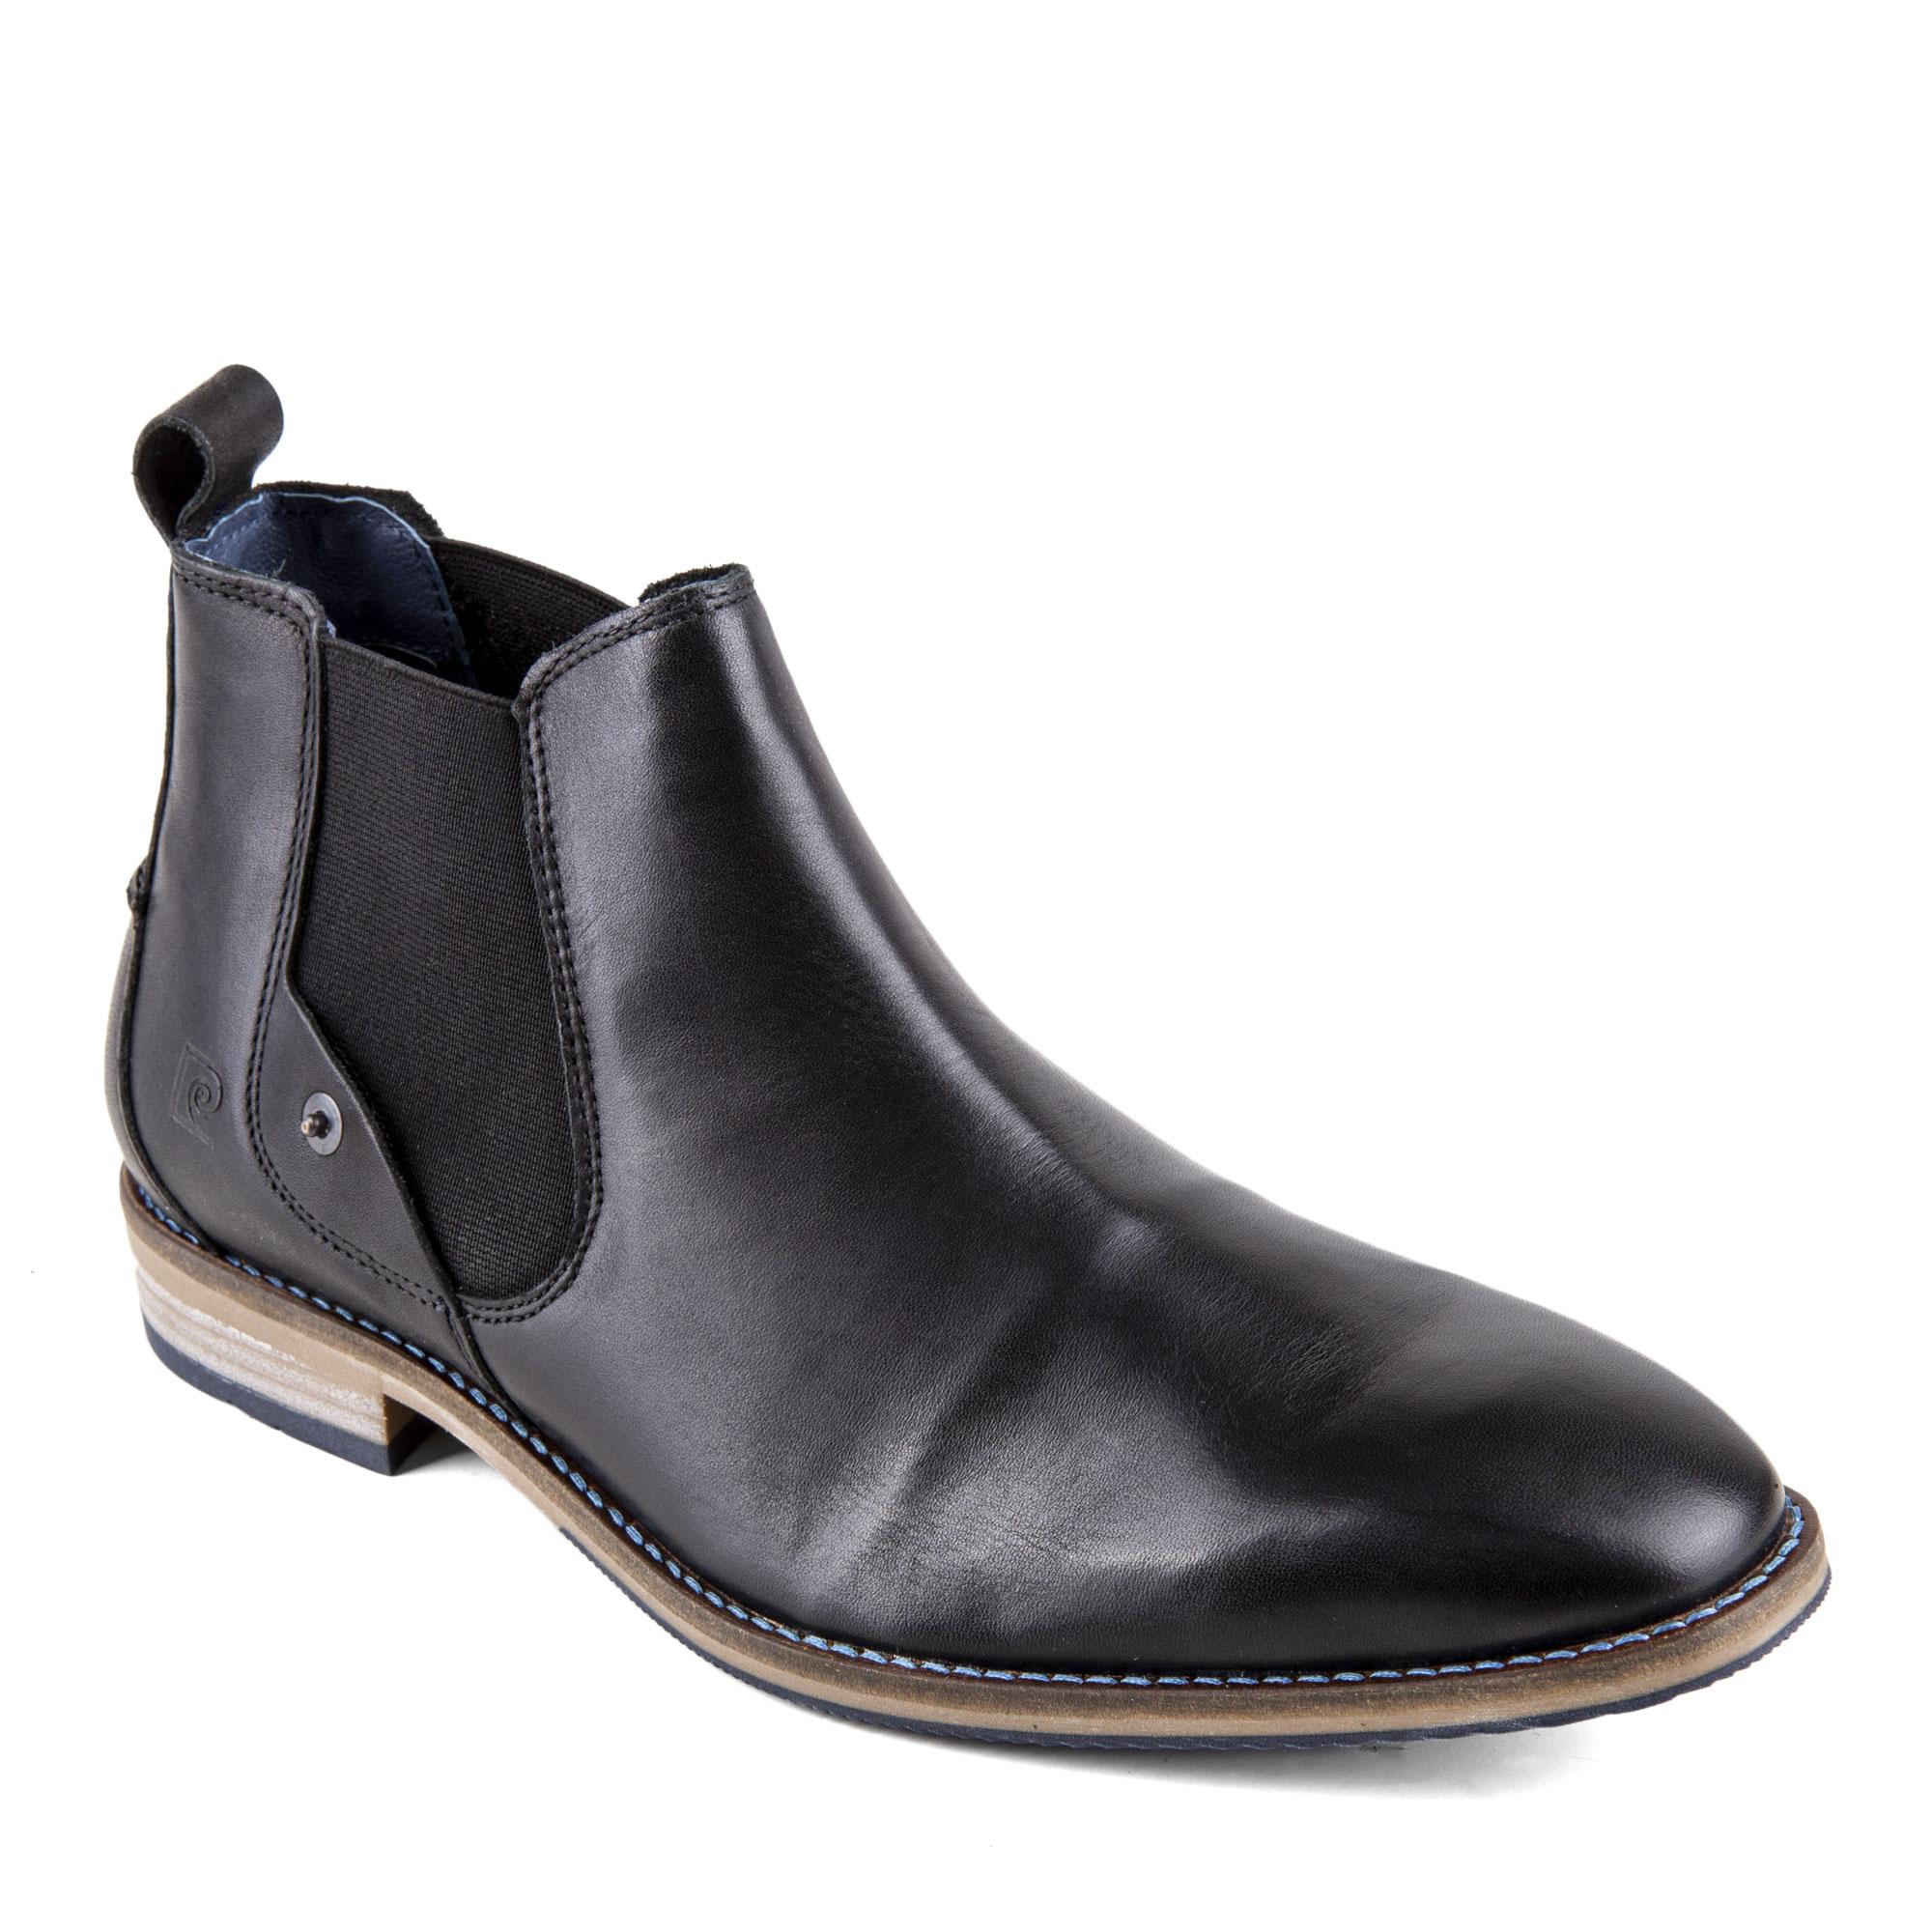 ac5042af0 Chaussures Bottines noires cuir Homme PIERRE CARDIN